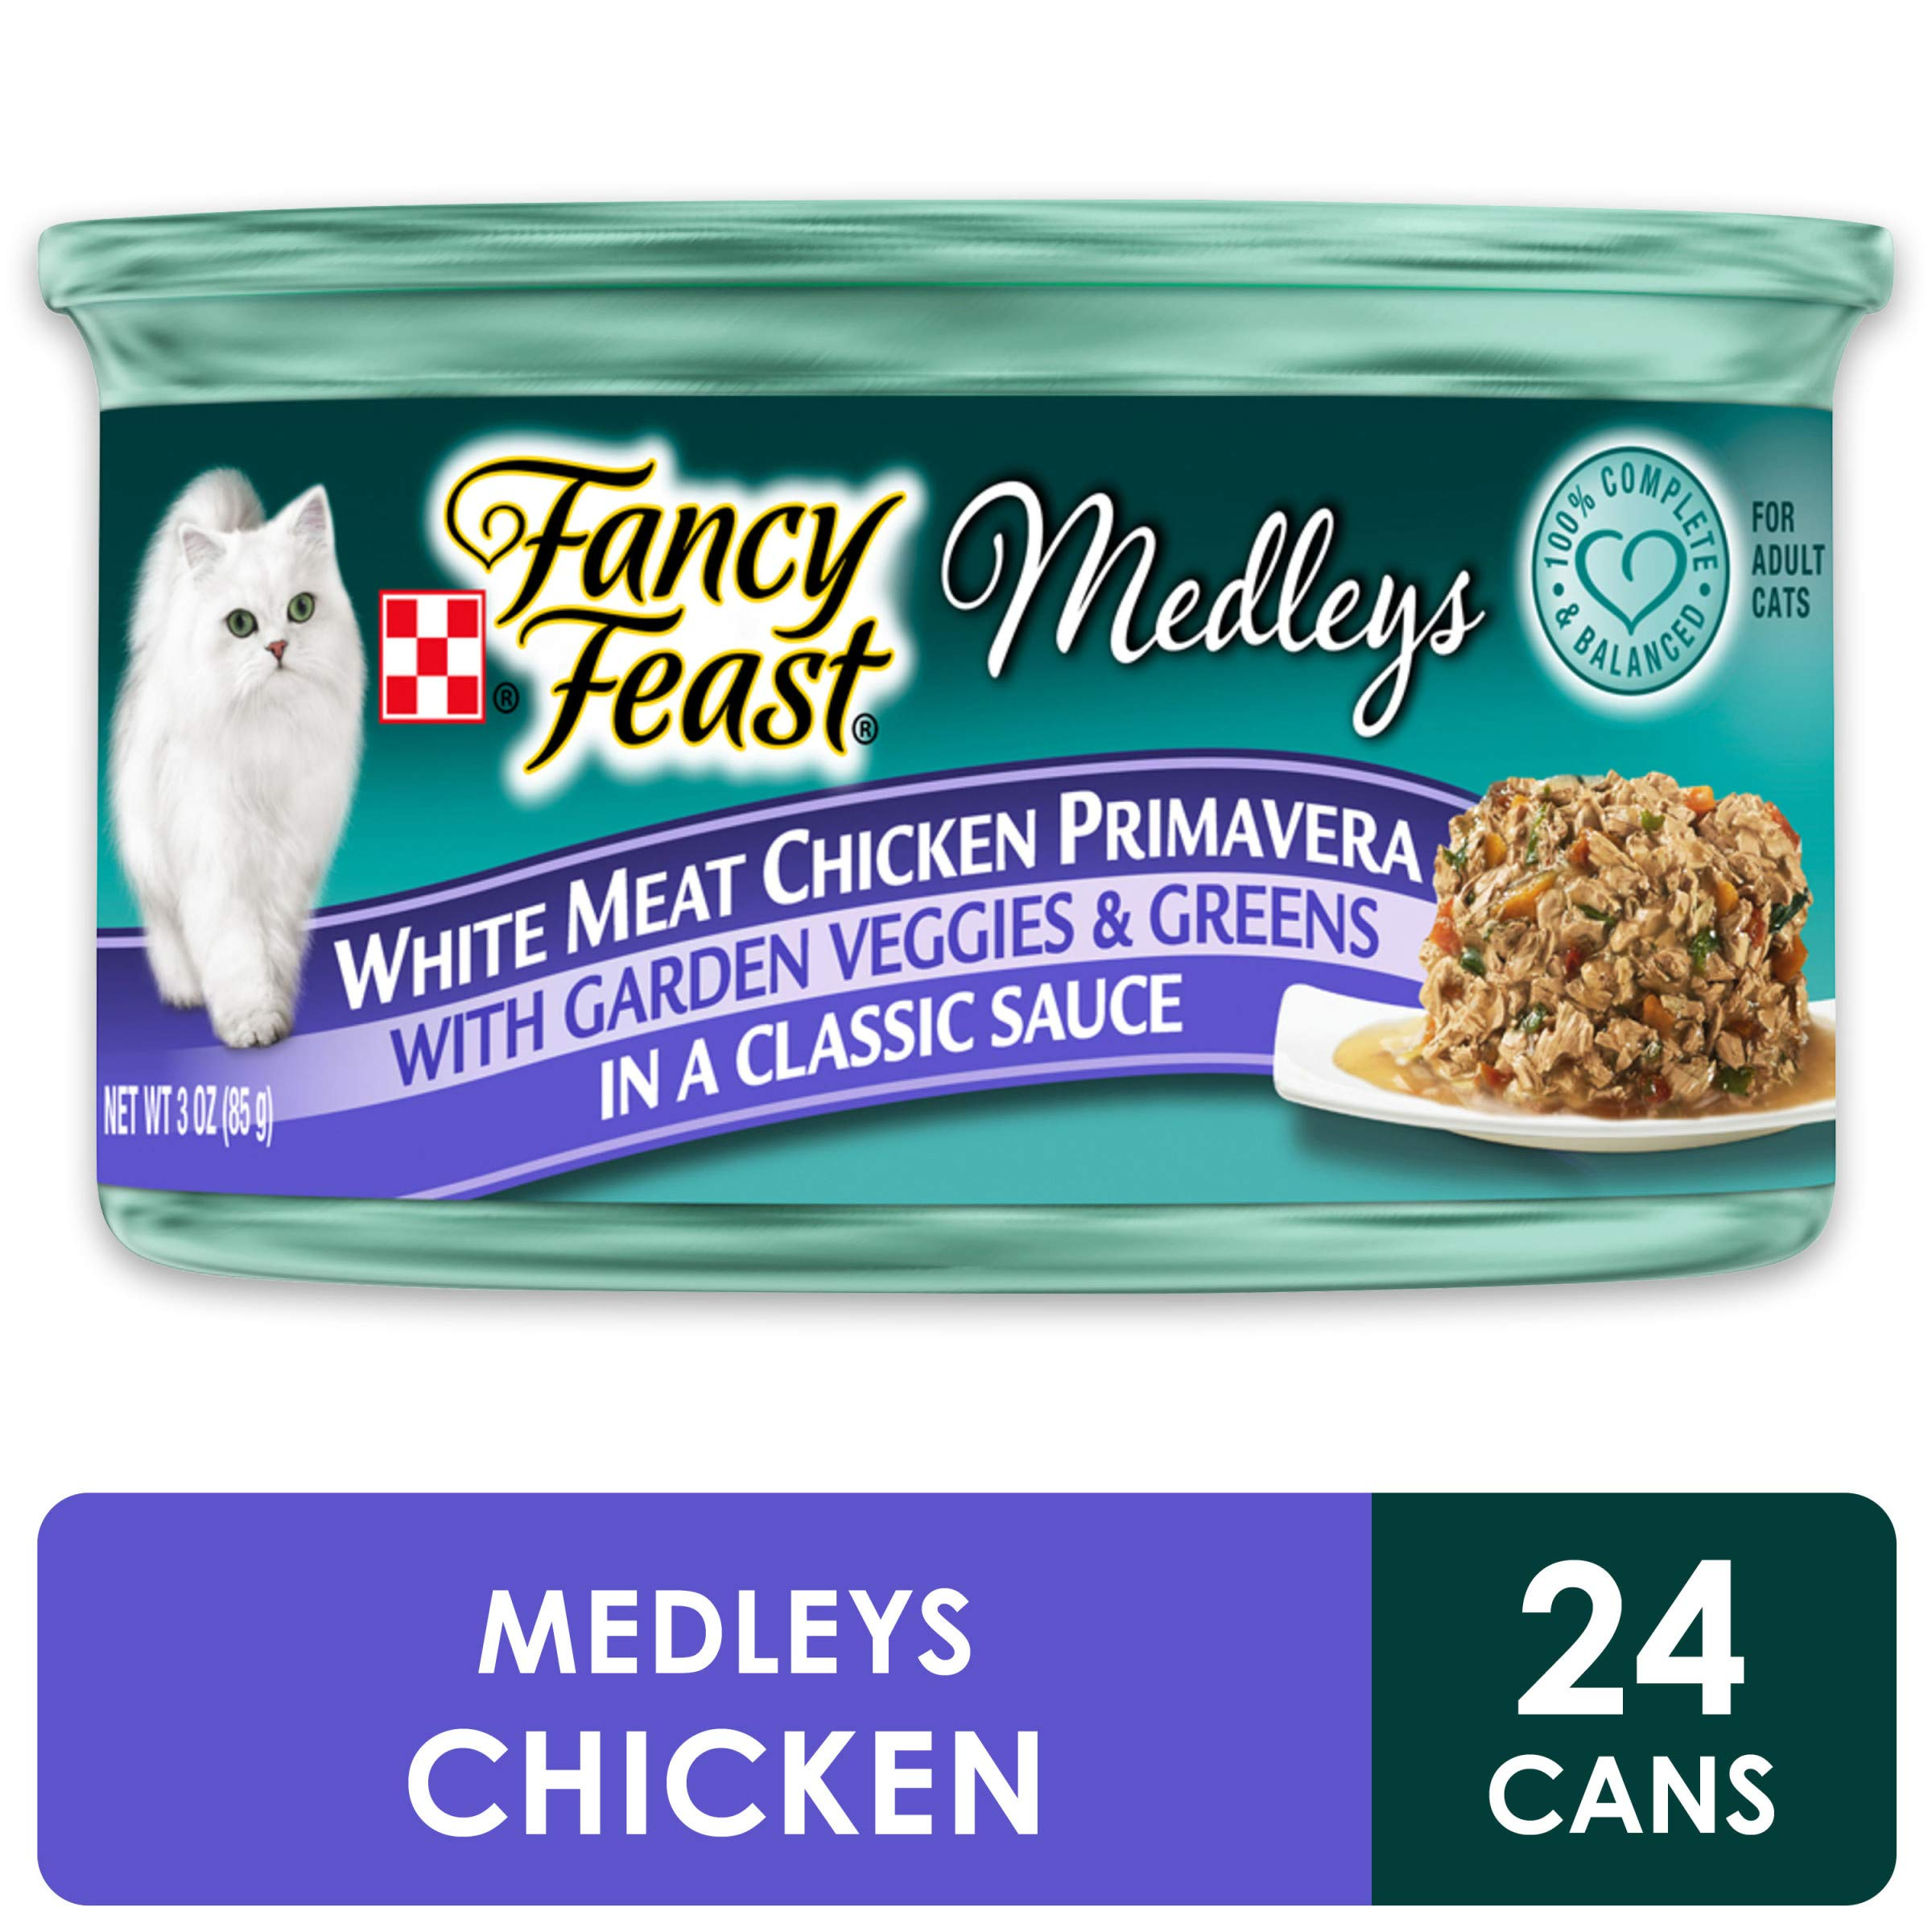 Purina Fancy Feast Gravy Wet Cat Food, Medleys White Meat Chicken Primavera - (24) 3 oz. Cans by Purina Fancy Feast